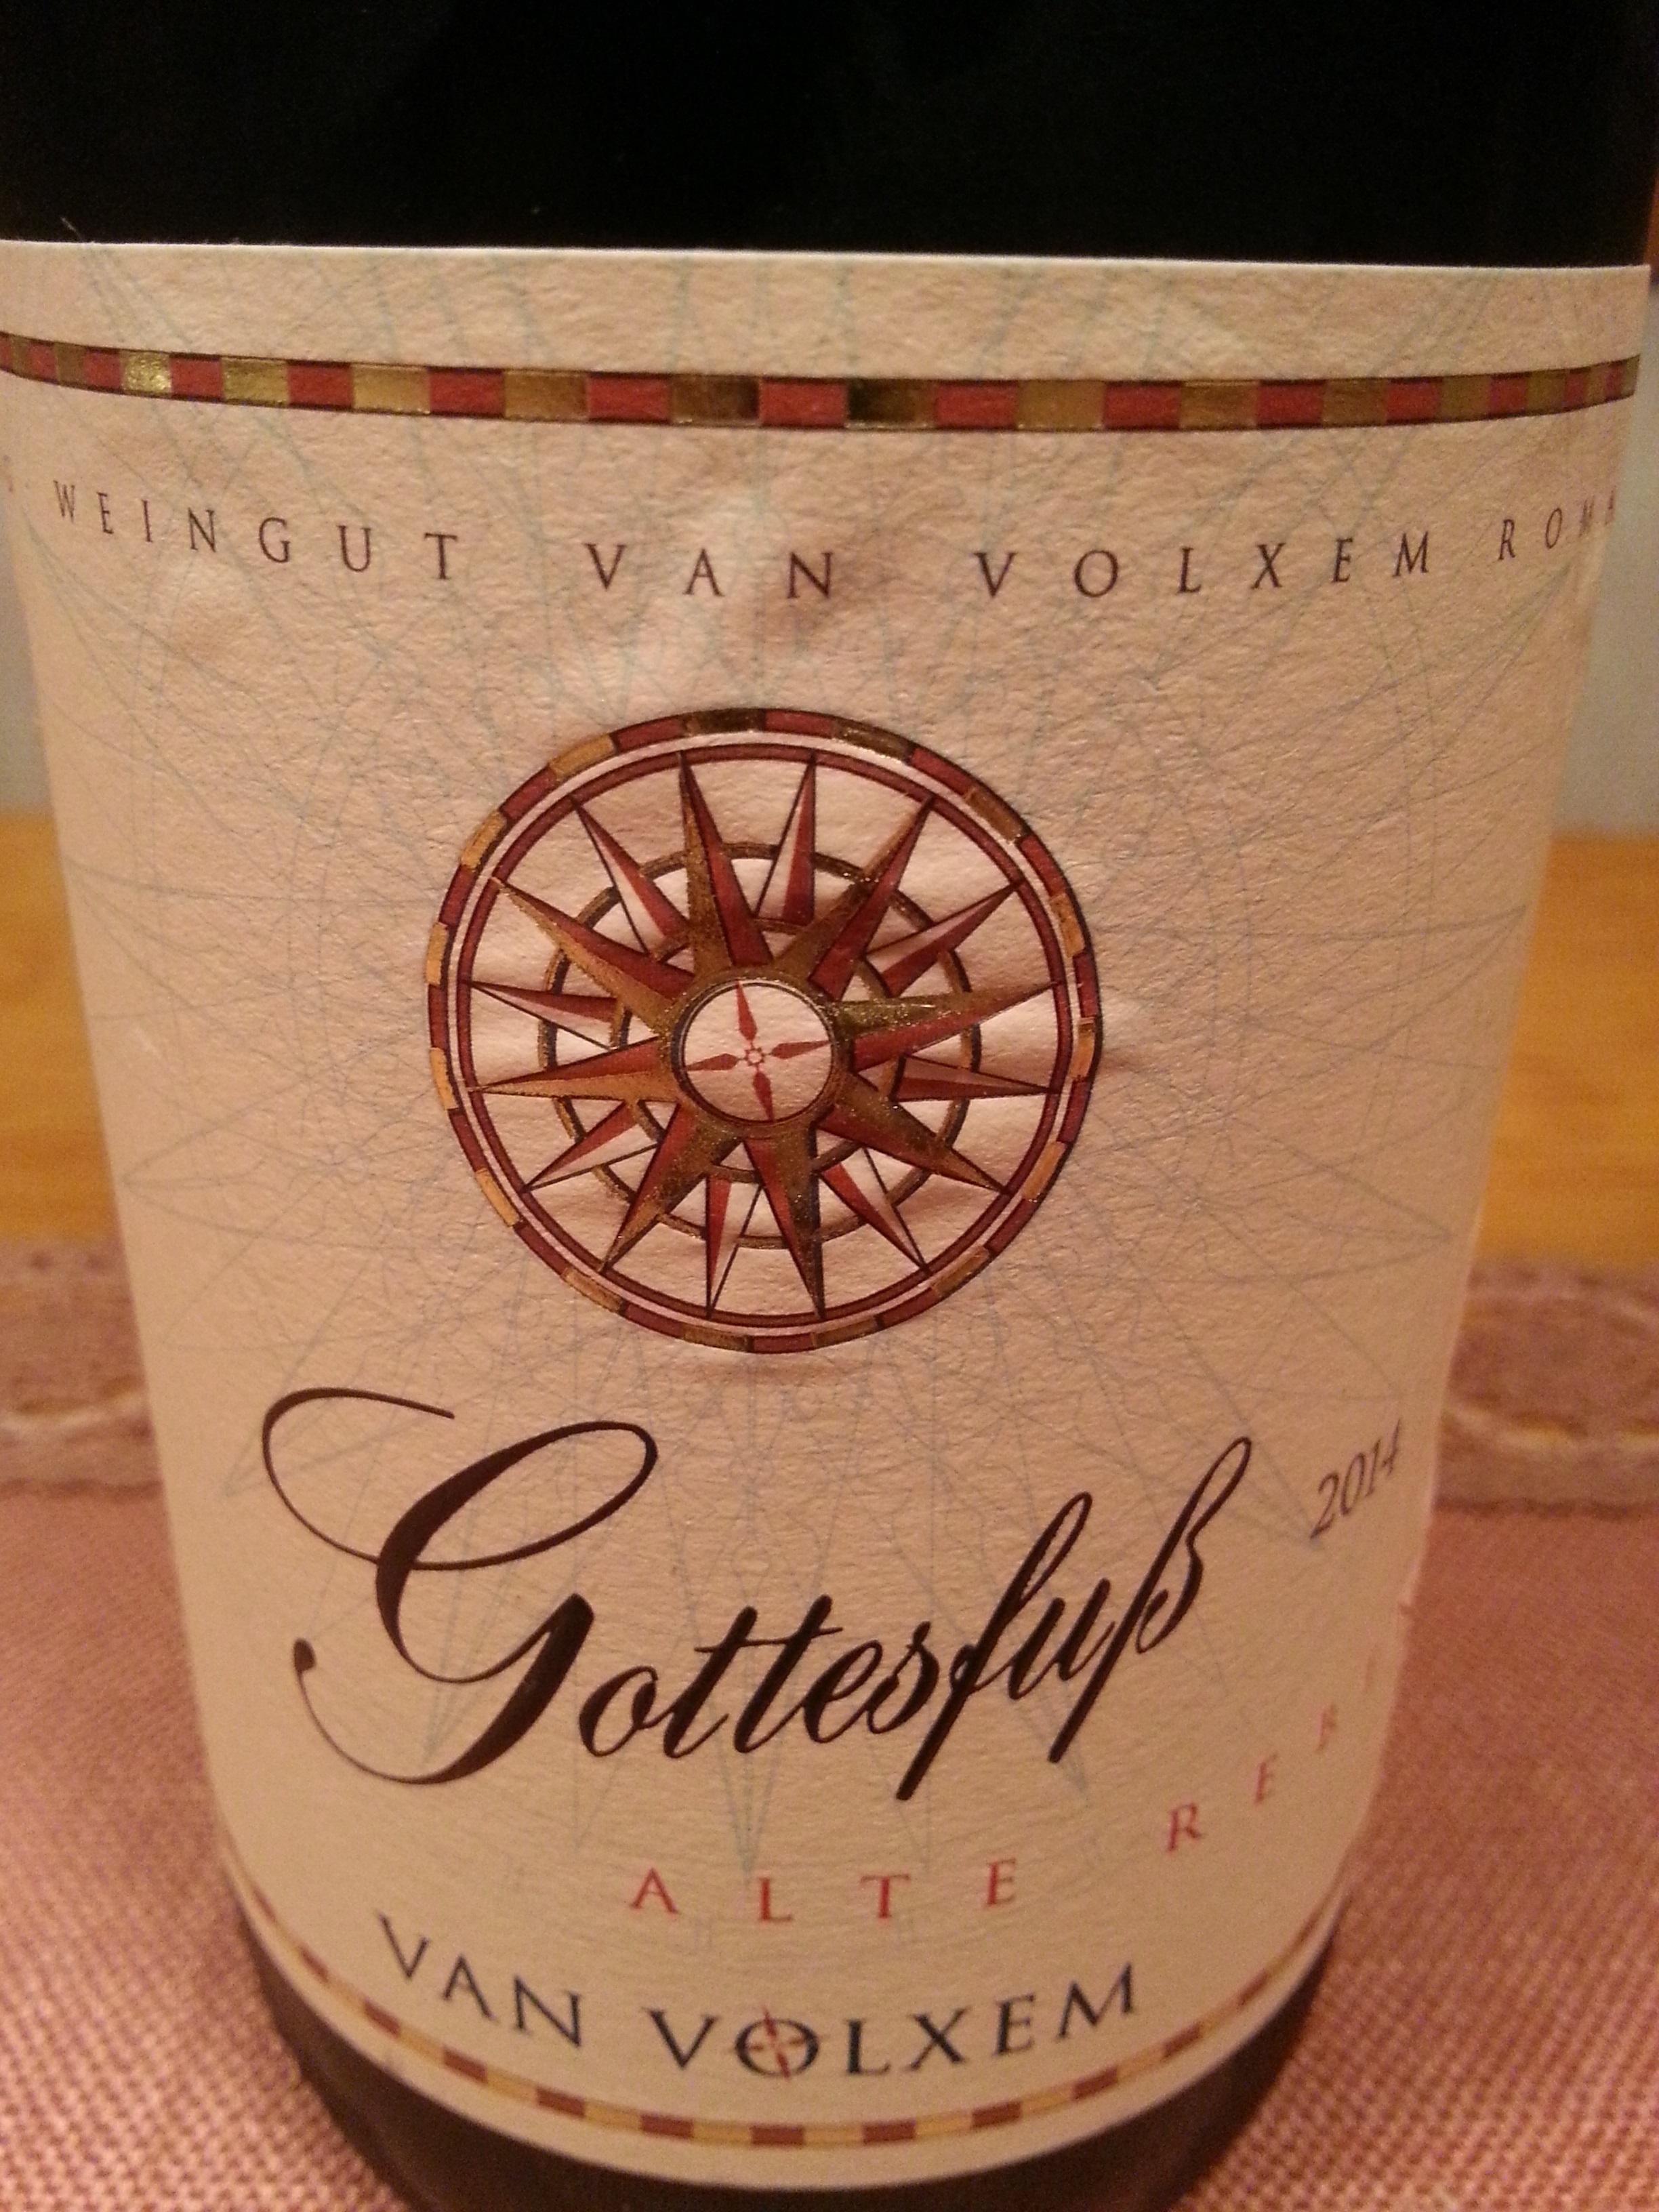 2014 Riesling Alte Reben Gottesfuß GG | Van Volxem